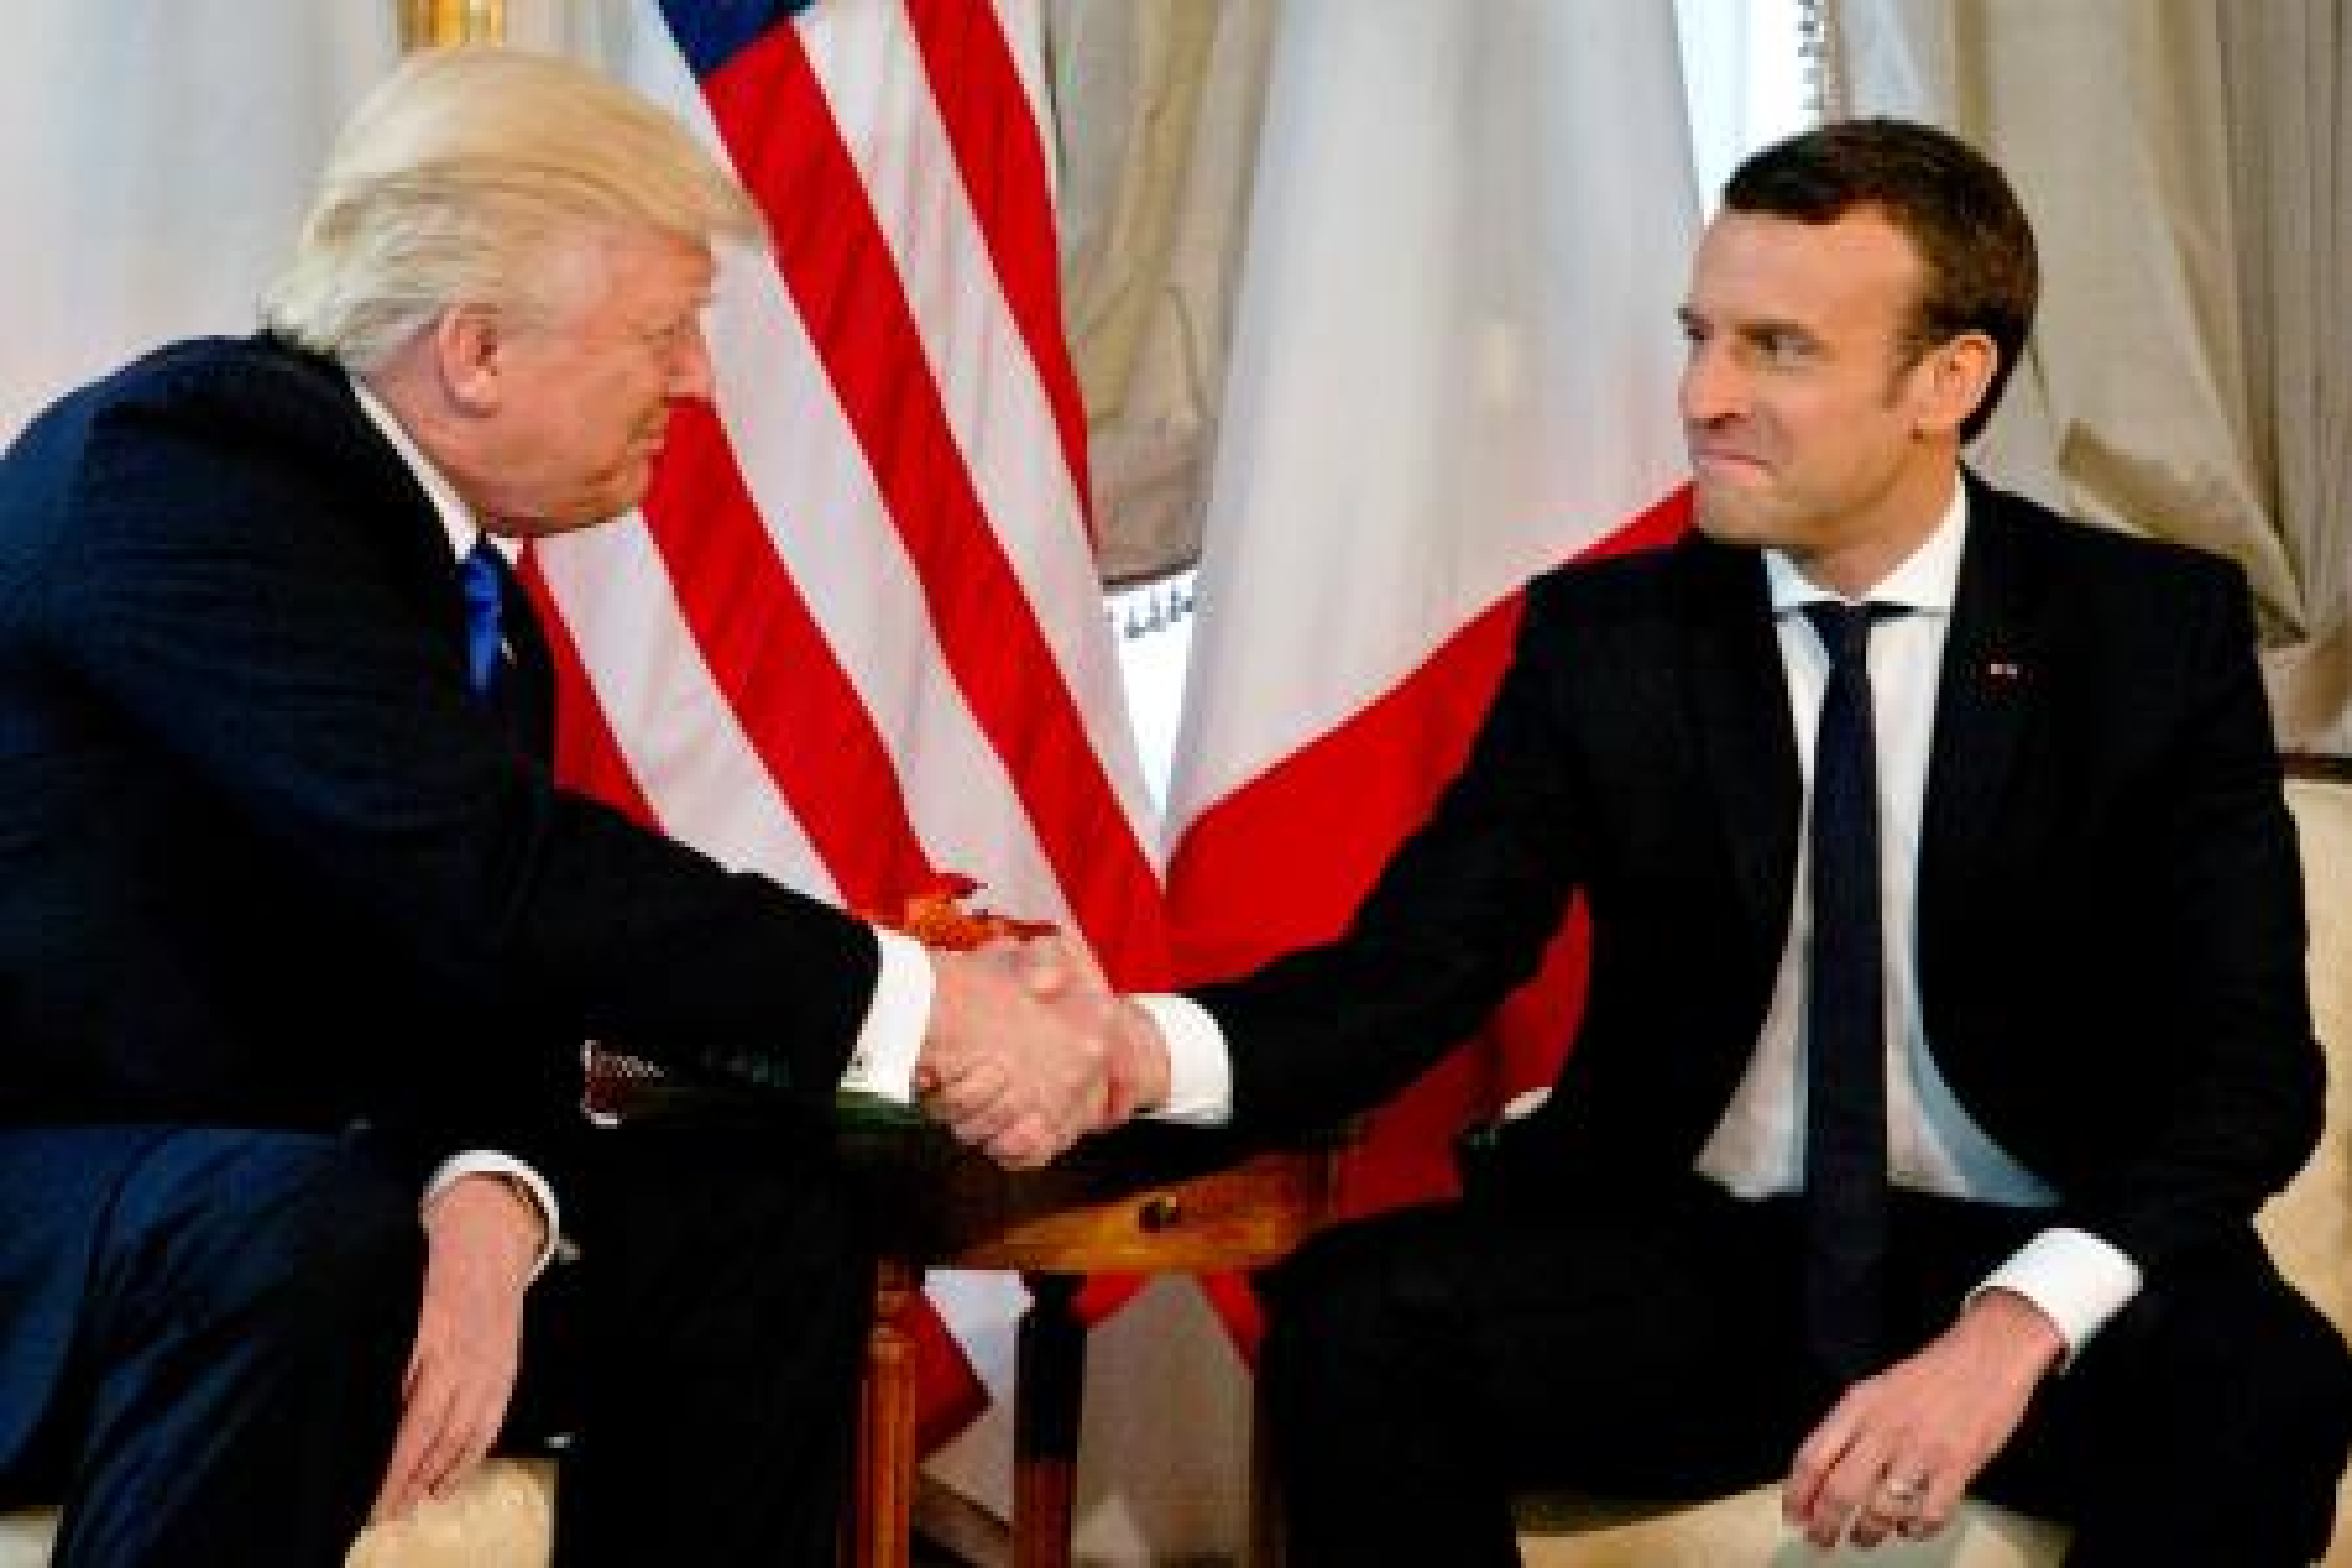 Macron Trump handshake